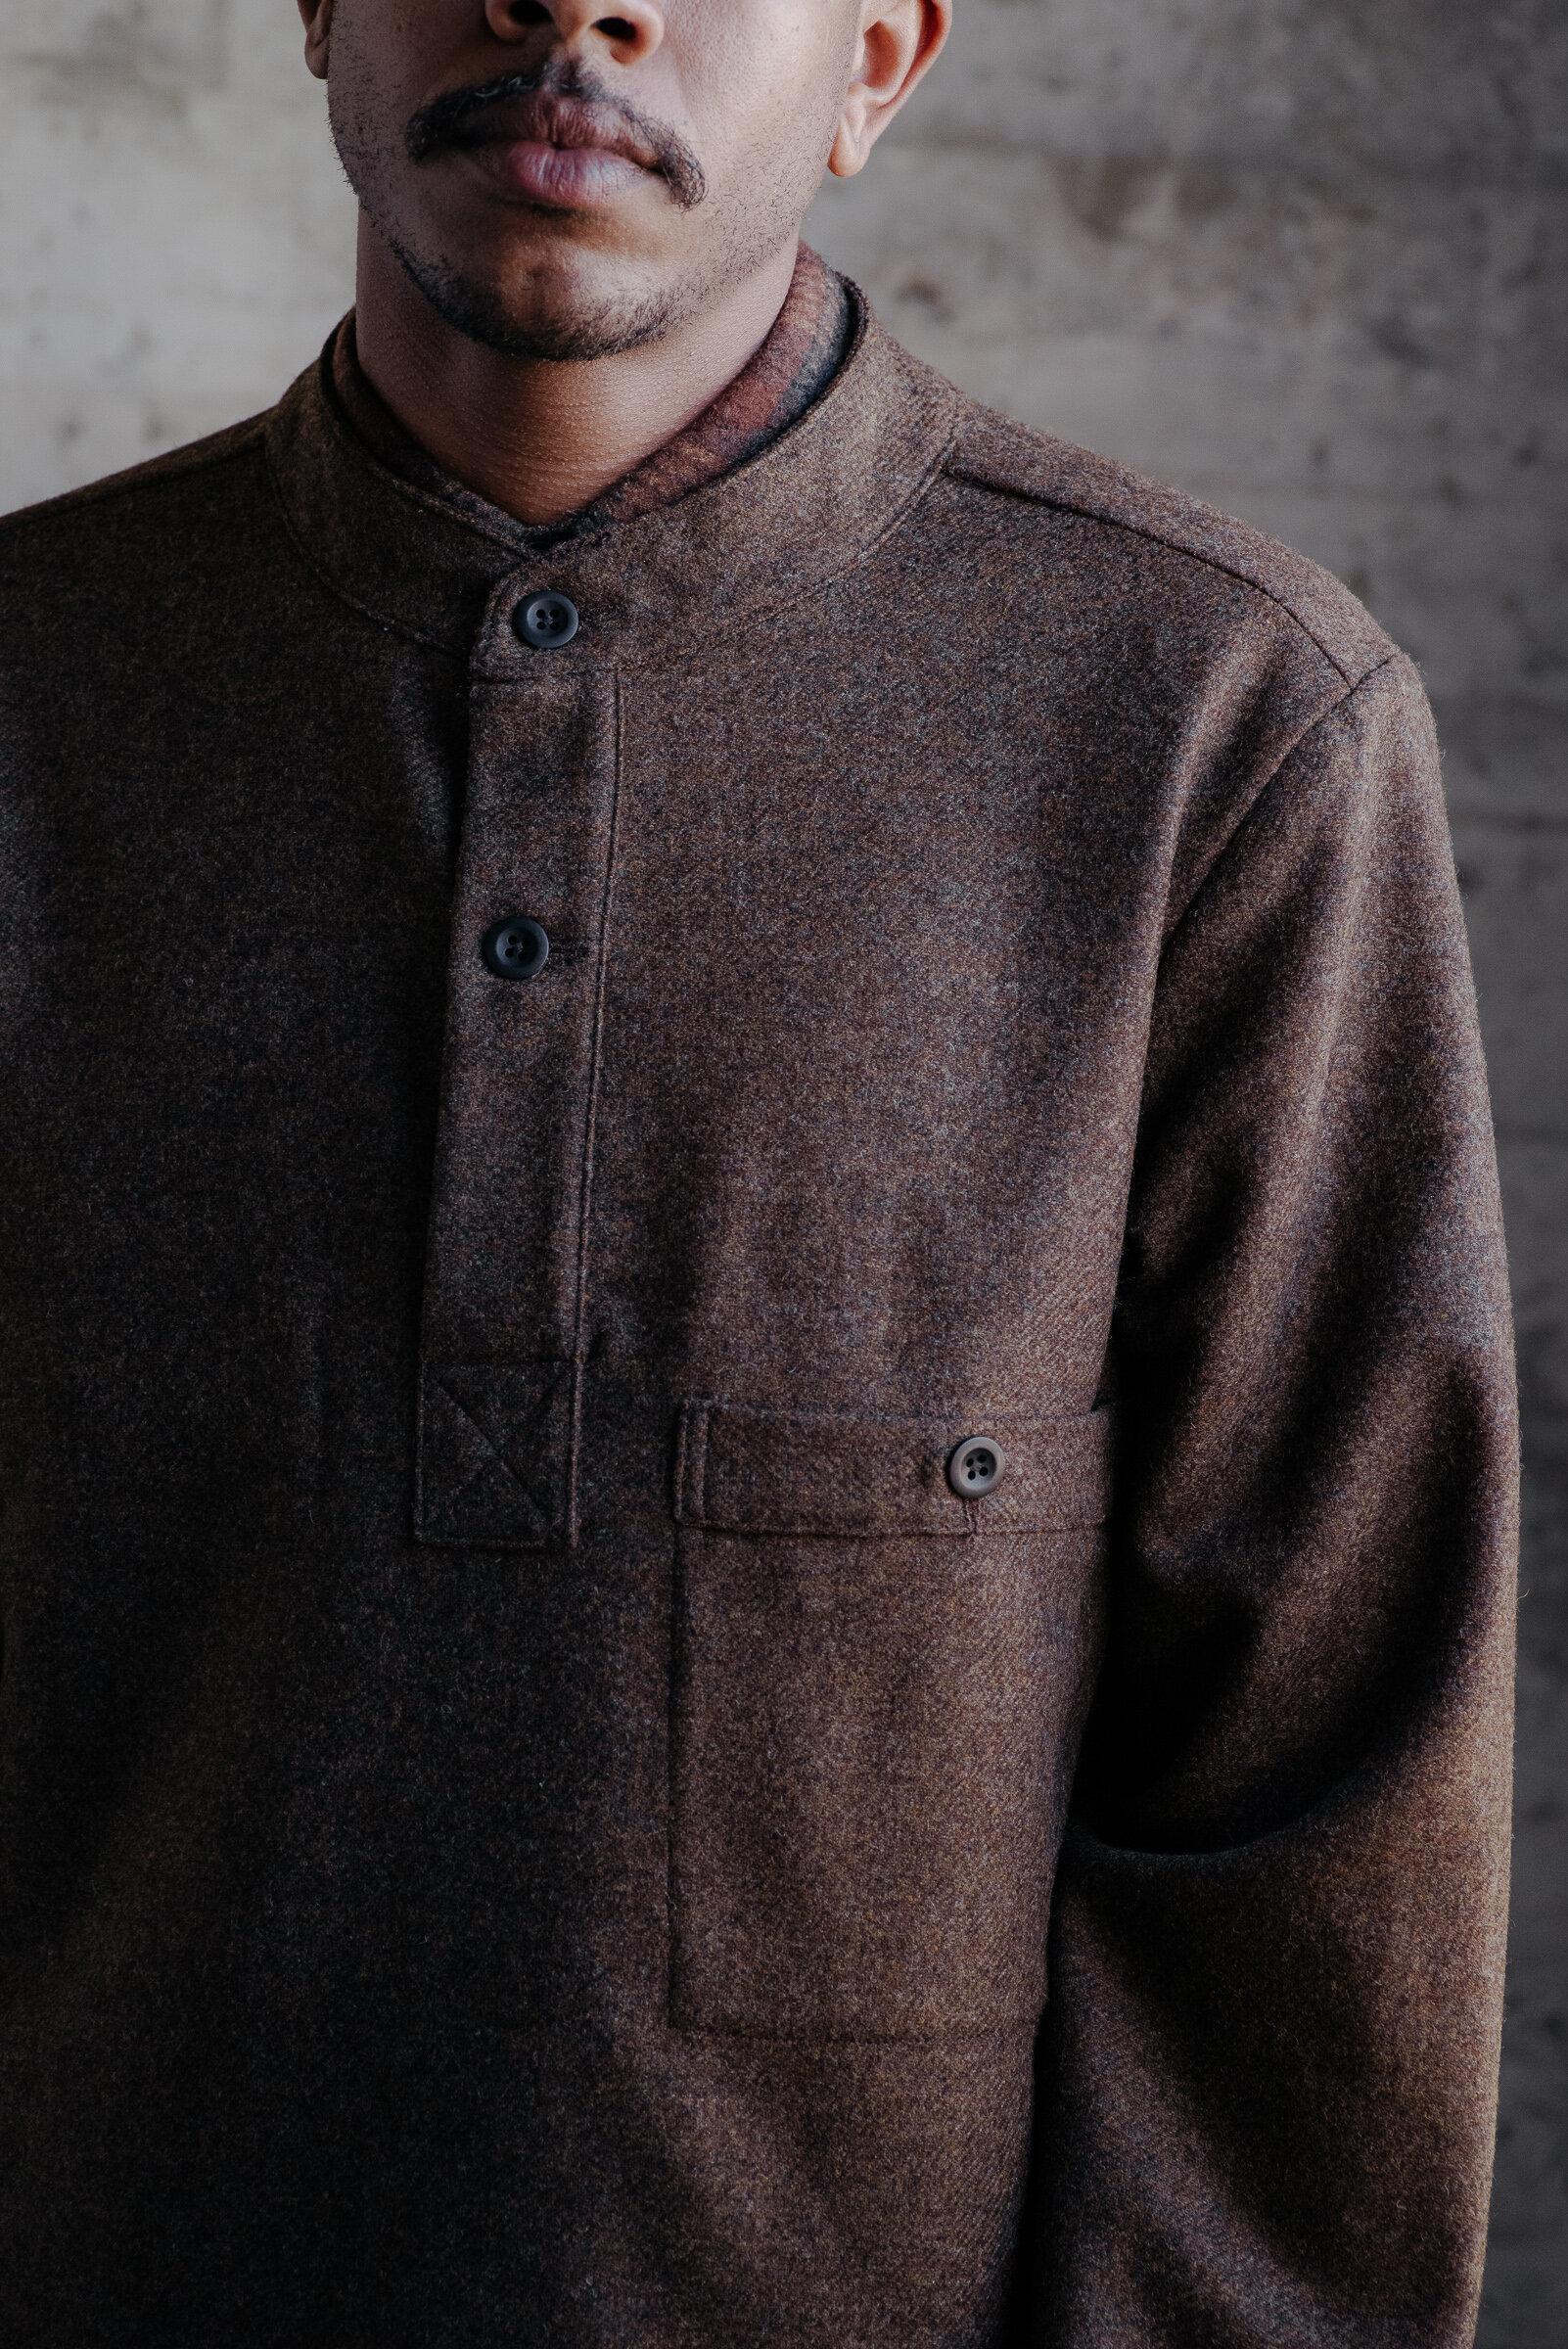 evan-kinori-pullover-rust-lambswool-wool-flannel-woven-in-england-4